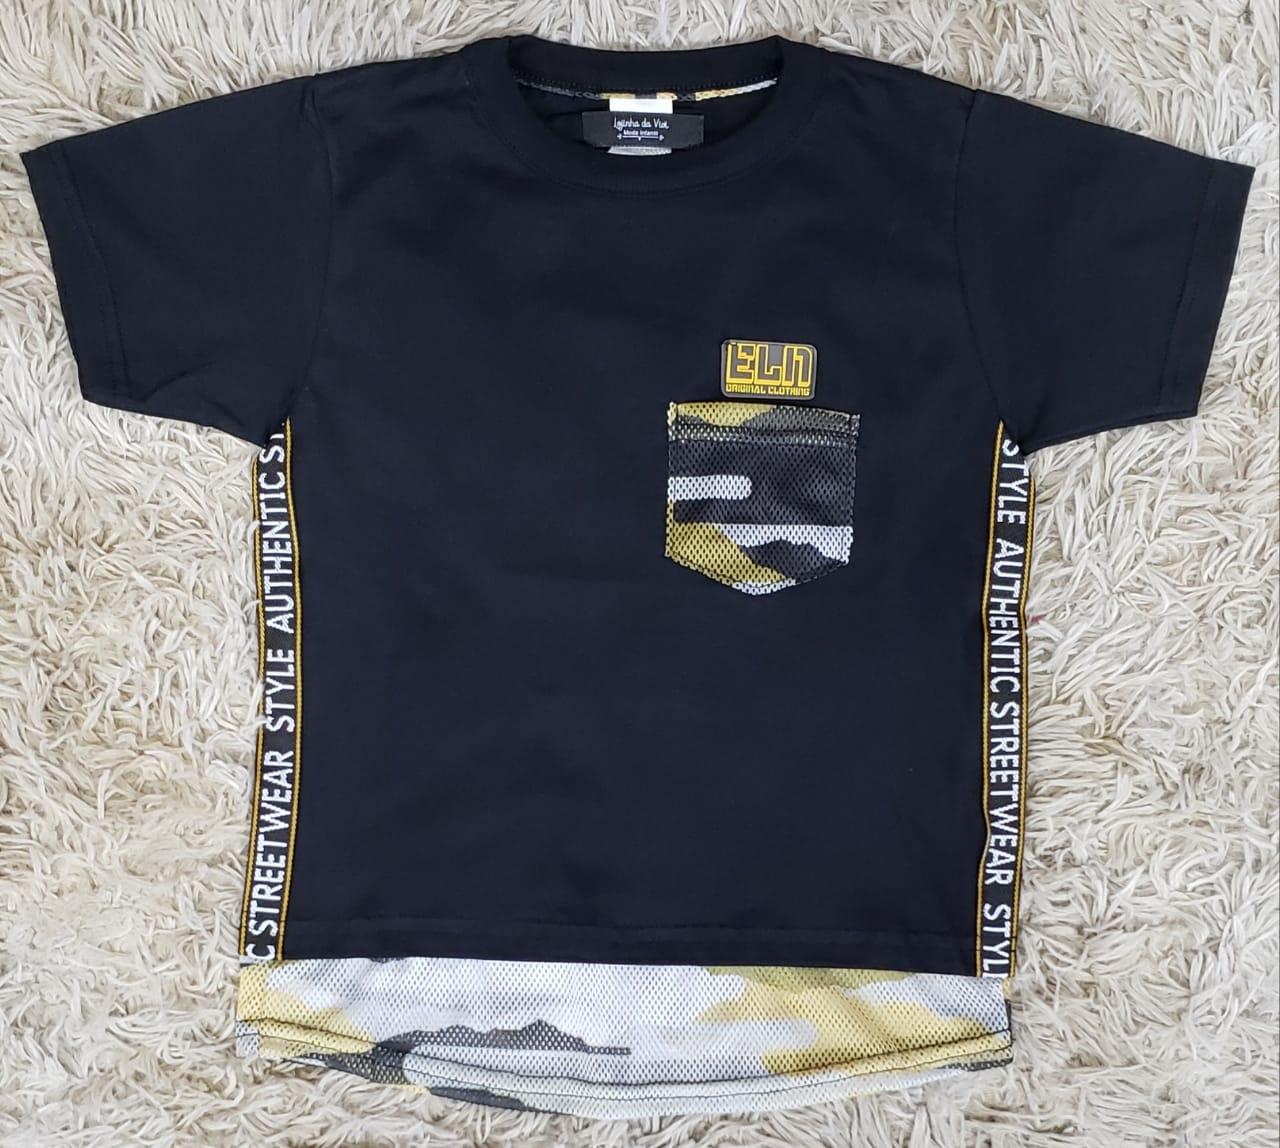 Camiseta Long com Bolso Authentic Street